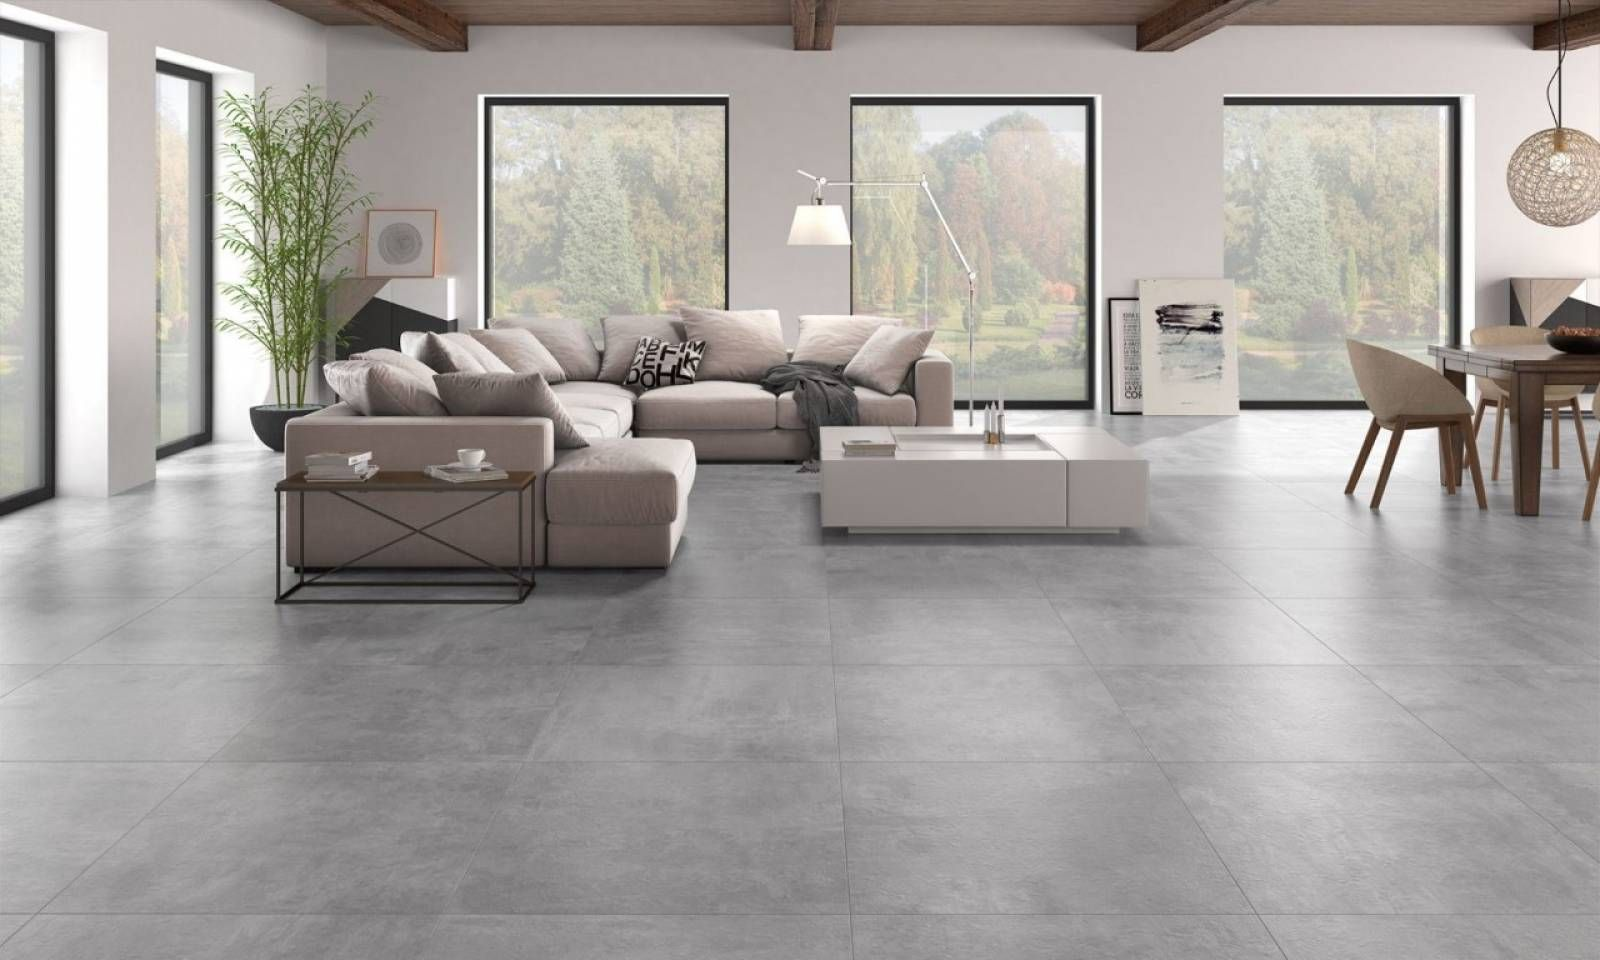 Salon Carrelage Gris Beton Recherche Google Modern Living Room Interior Tile Floor Living Room Living Room Interior